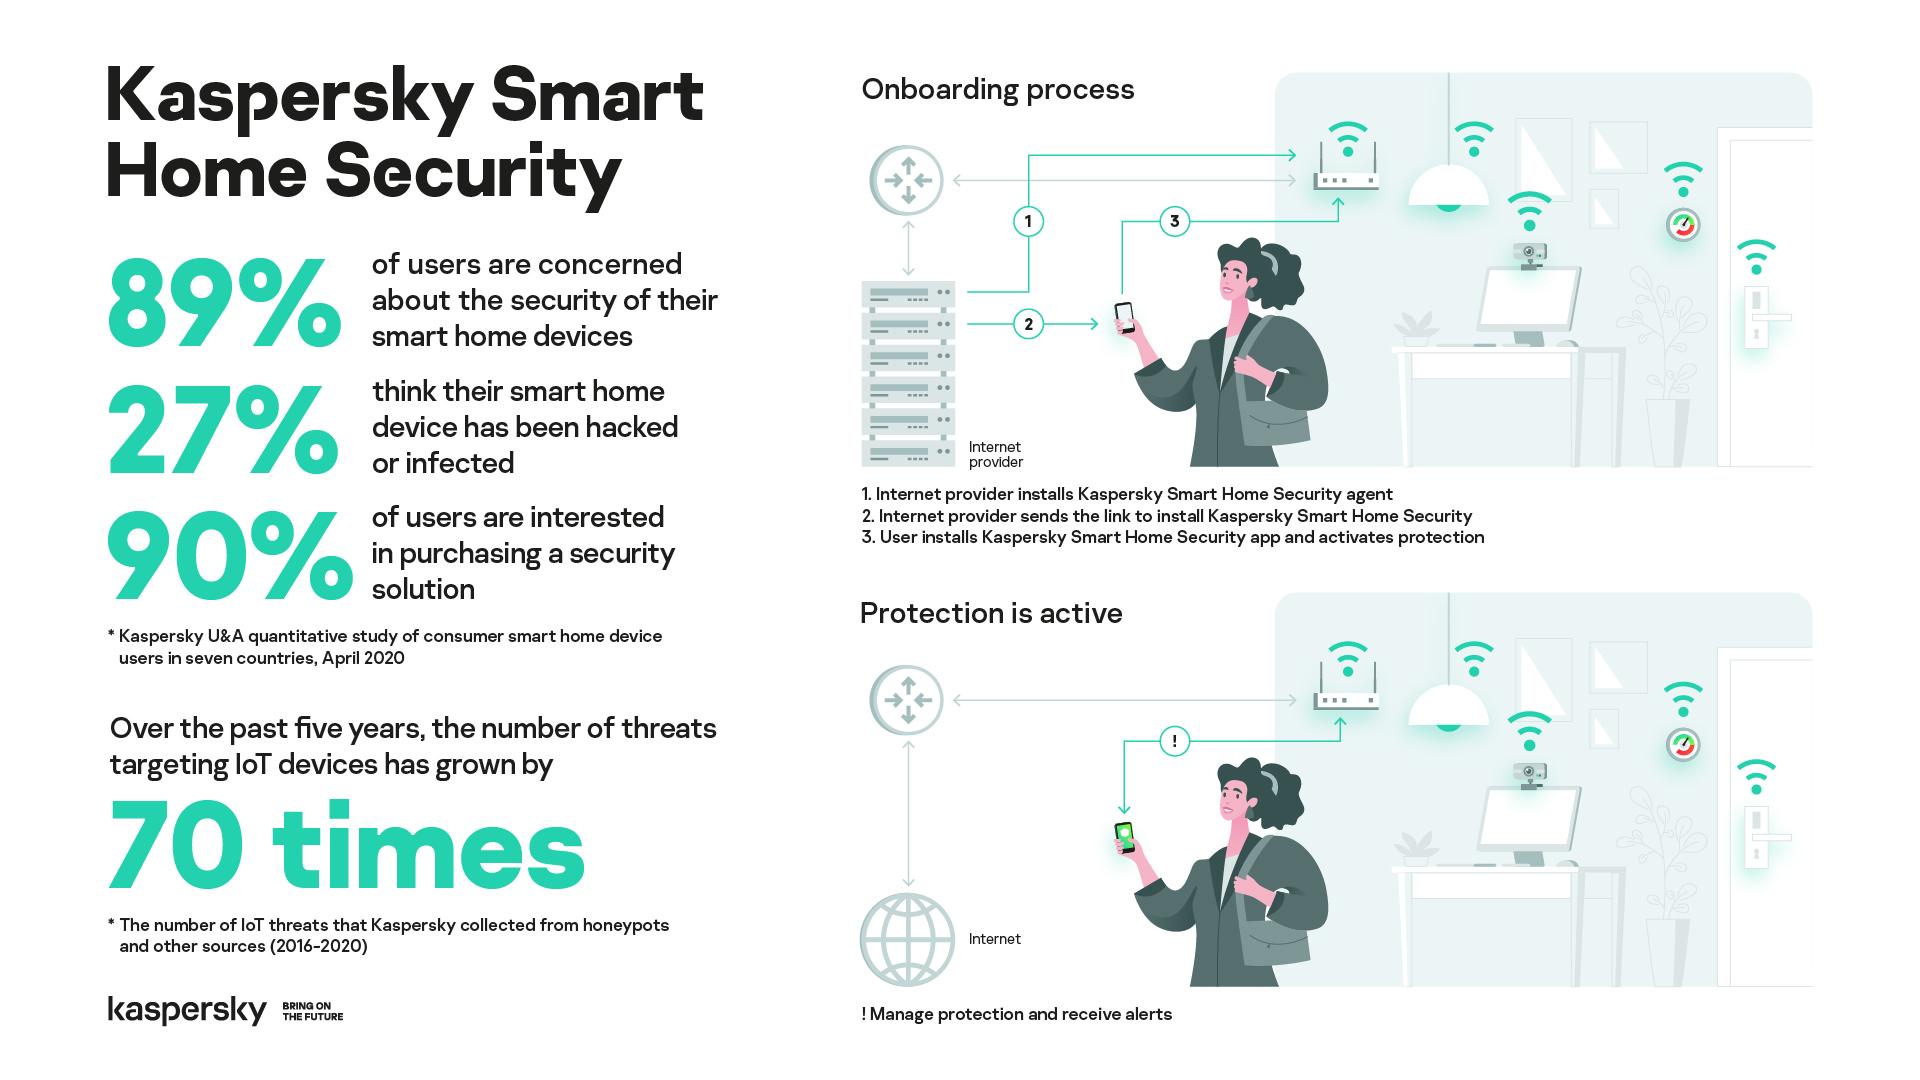 Kaspersky Smart Home Security